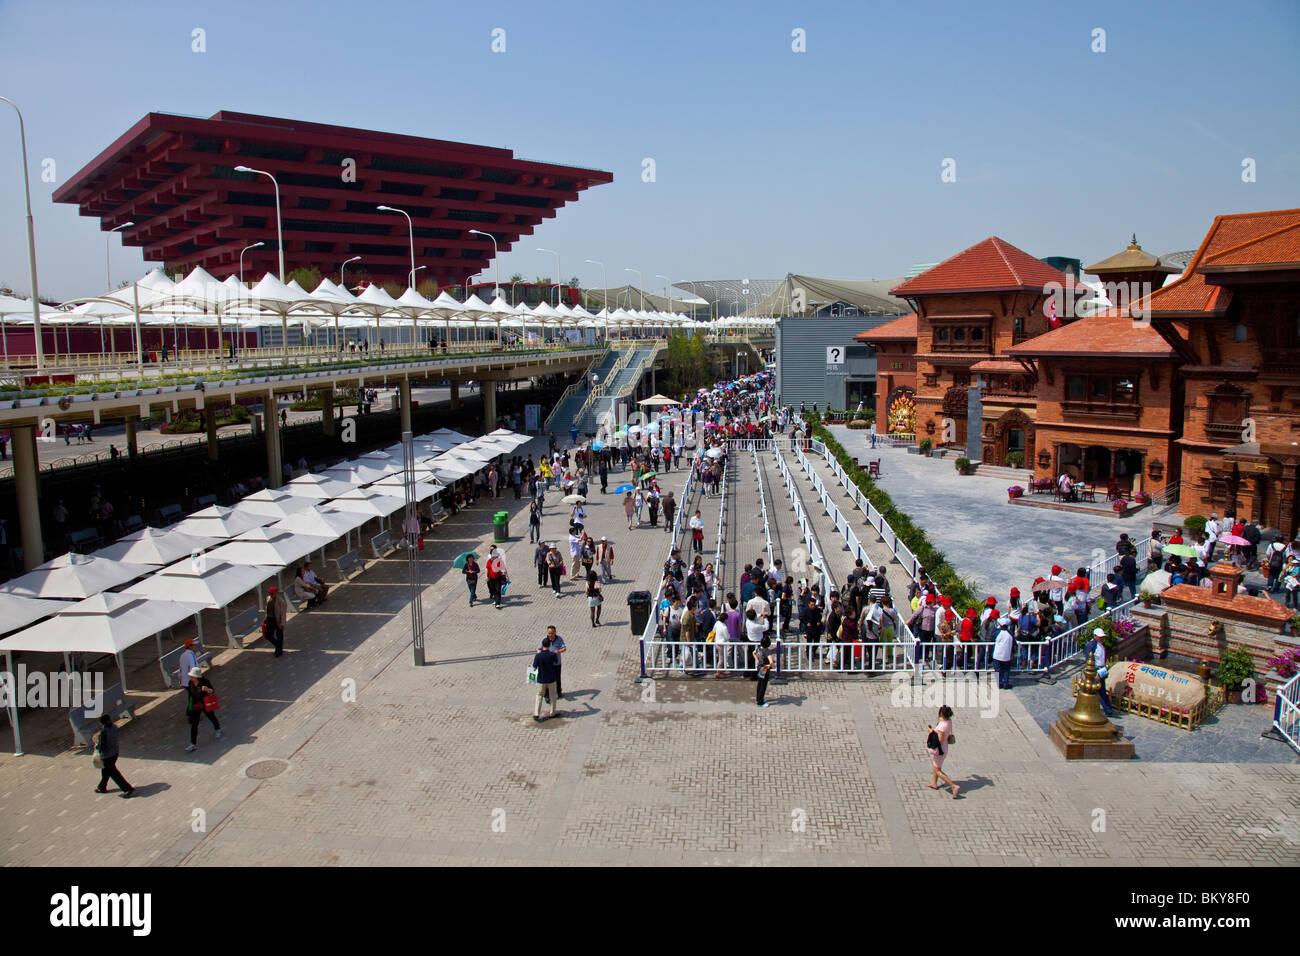 China and Nepal Pavillion at Expo 2010, Shanghai, China World's Fair - Stock Image